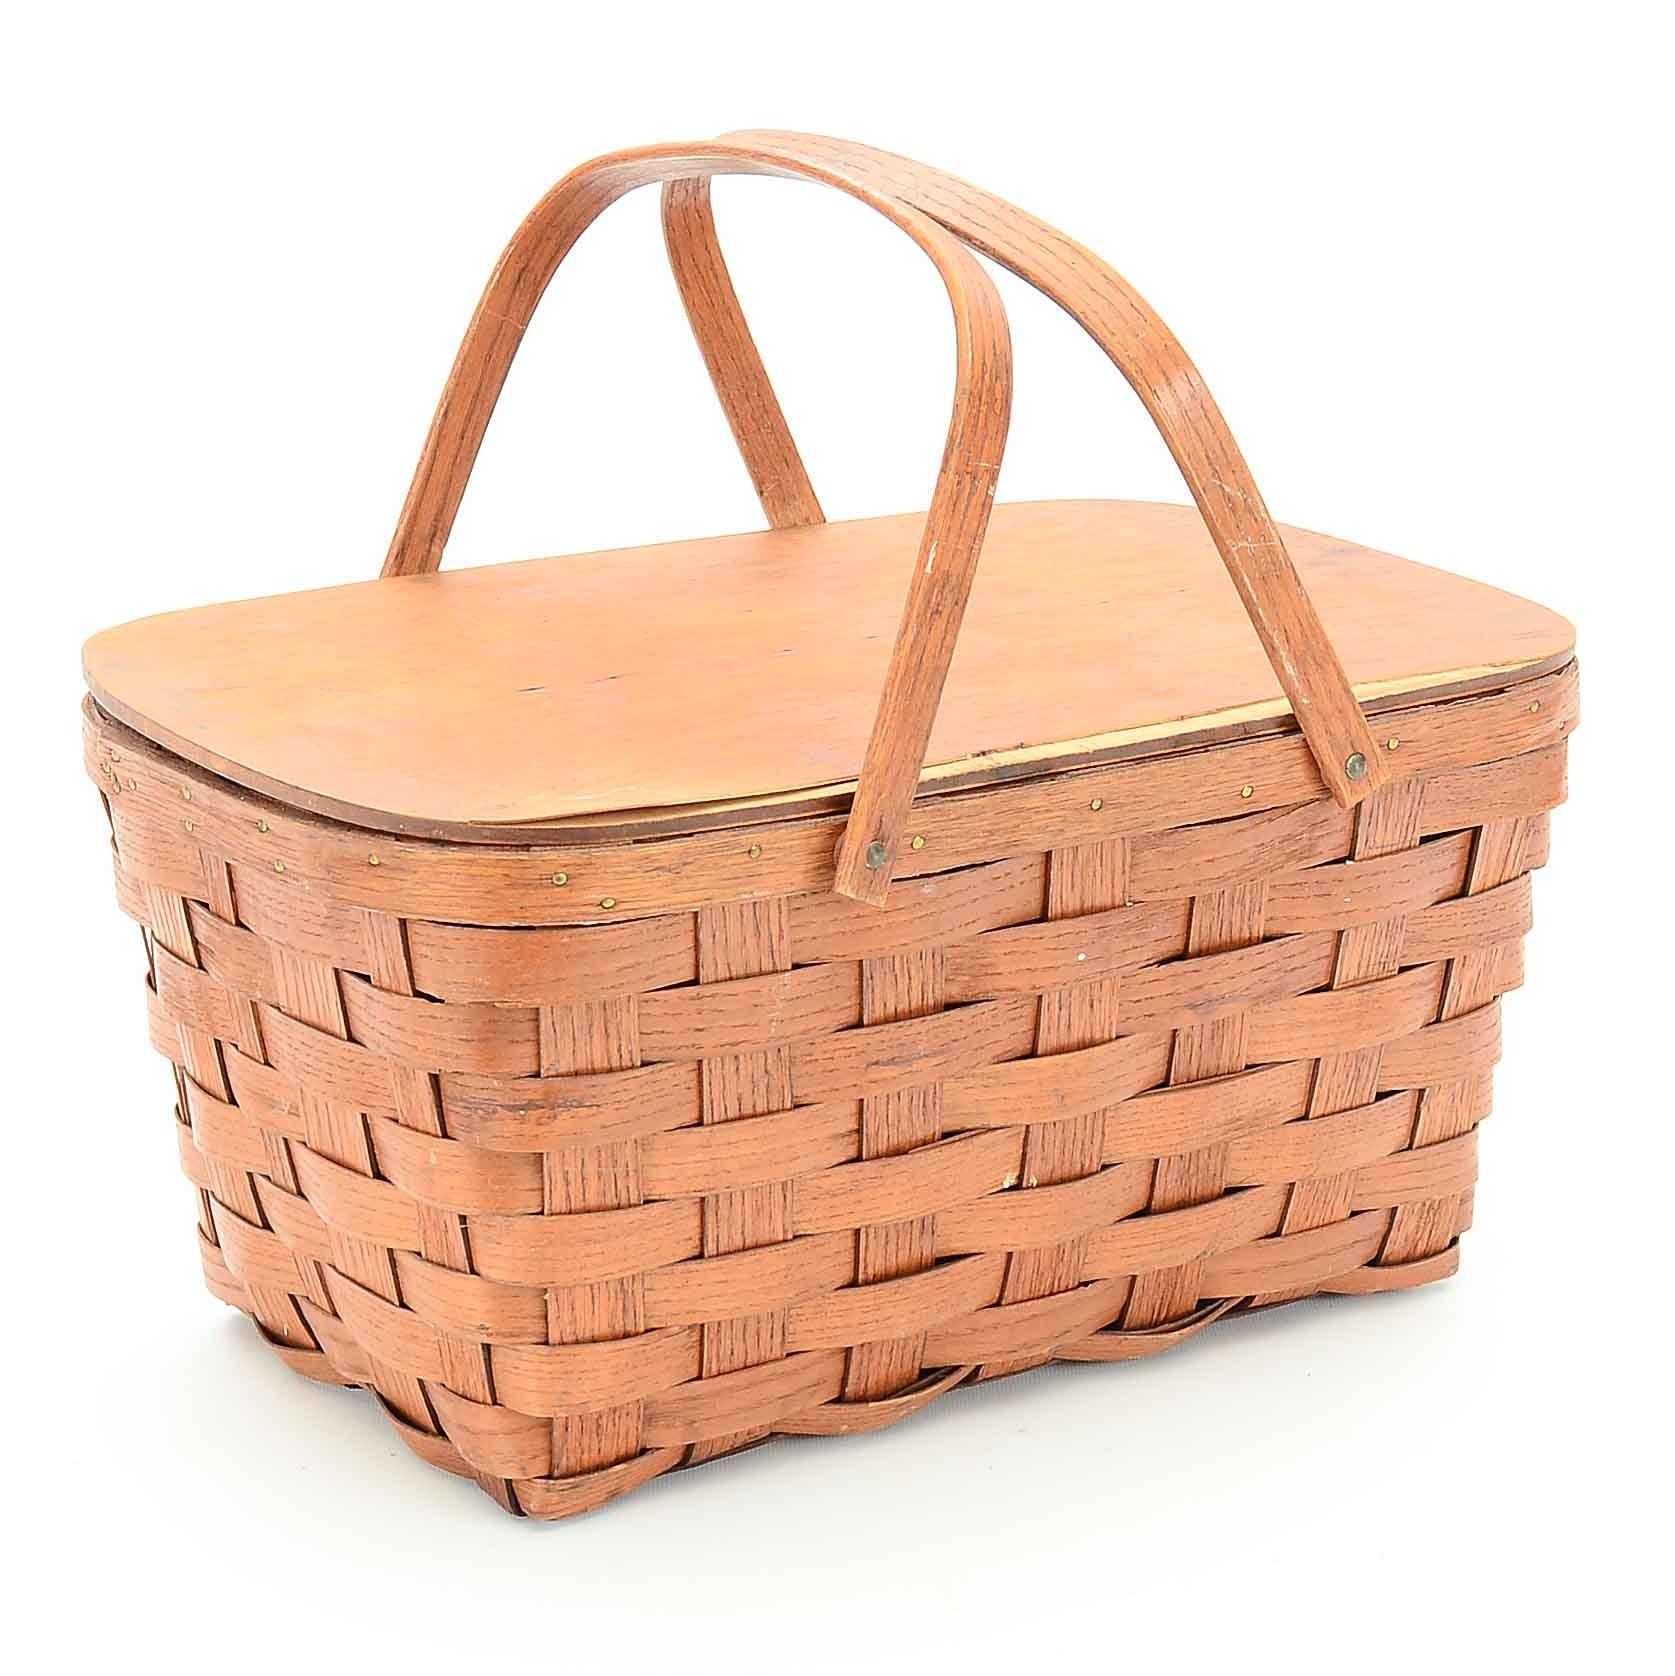 Vintage 1930s American Wicker Picnic Basket